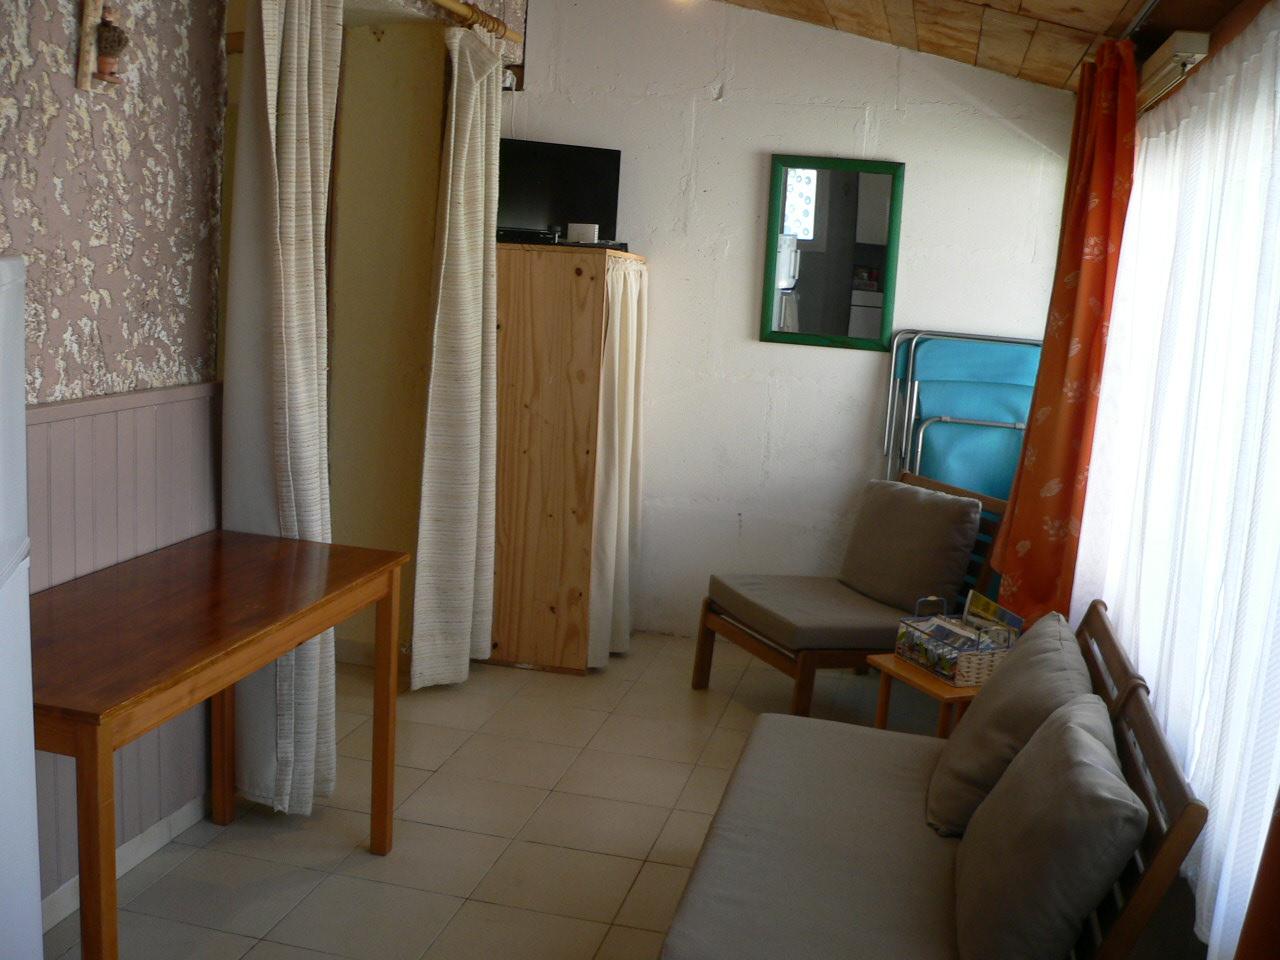 coin chambre dans salon cheap le coin salon photo le coin. Black Bedroom Furniture Sets. Home Design Ideas